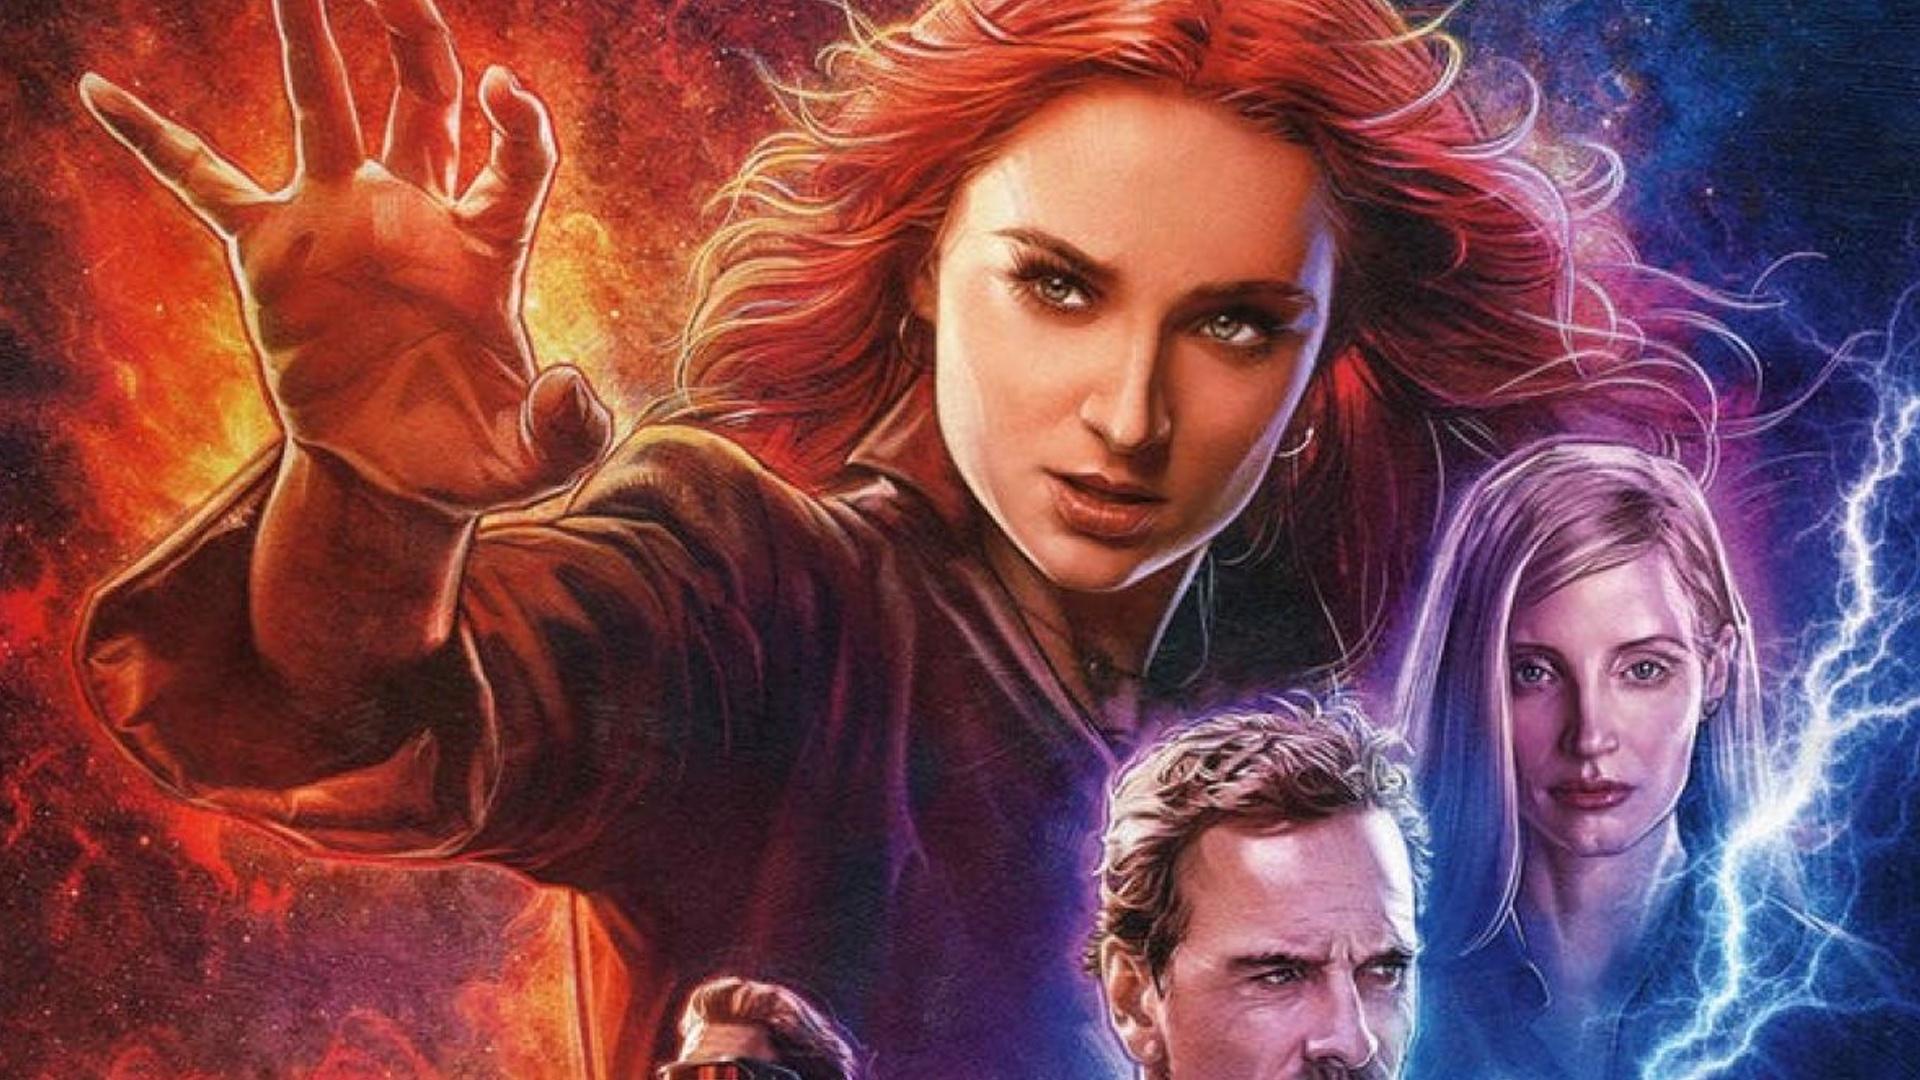 Film al cinema giugno 2019